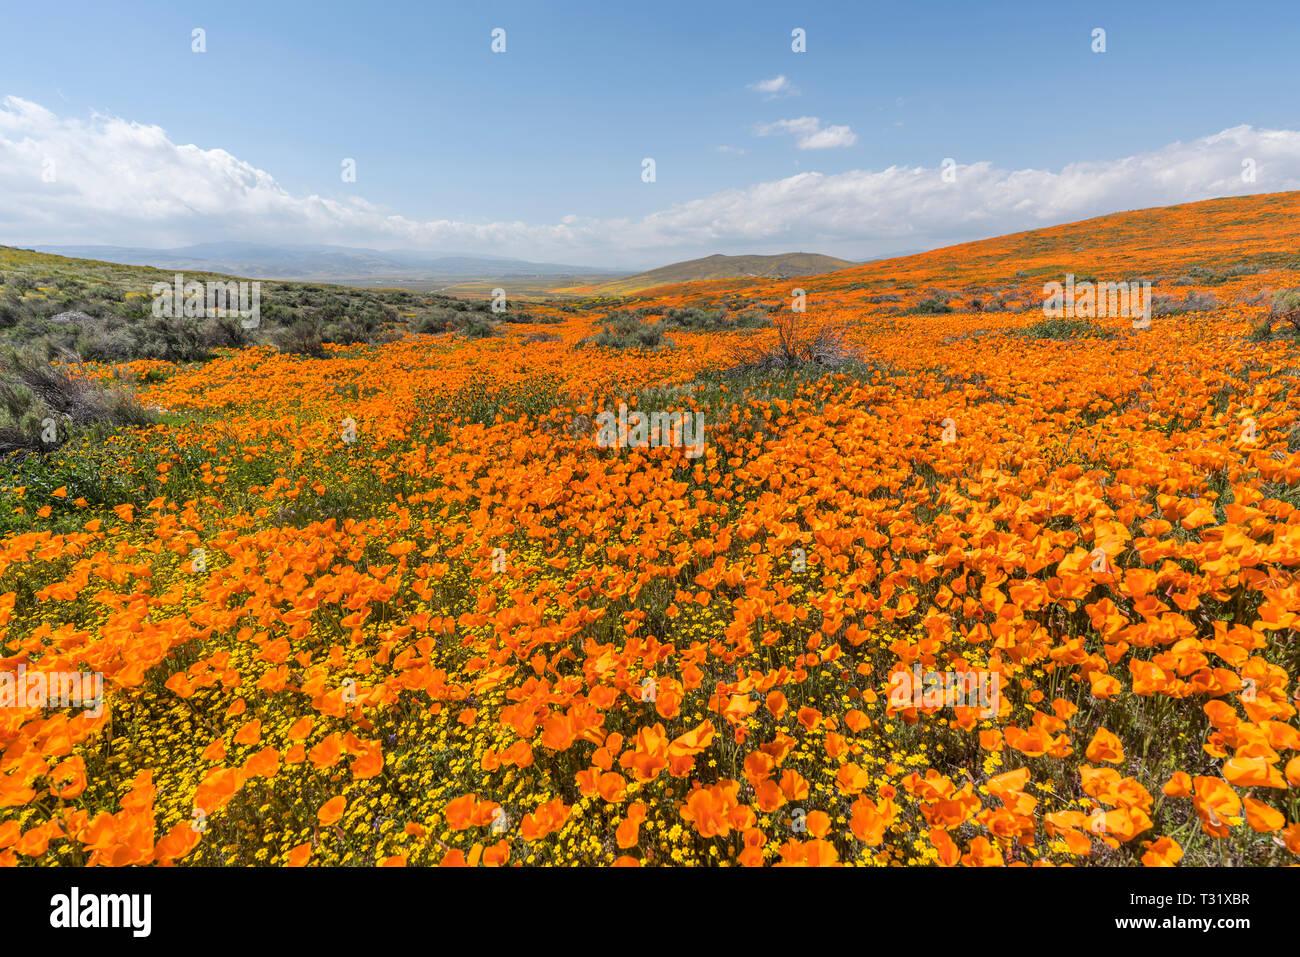 California poppy super bloom wildflower hillside near Lancaster in northern Los Angeles County. - Stock Image